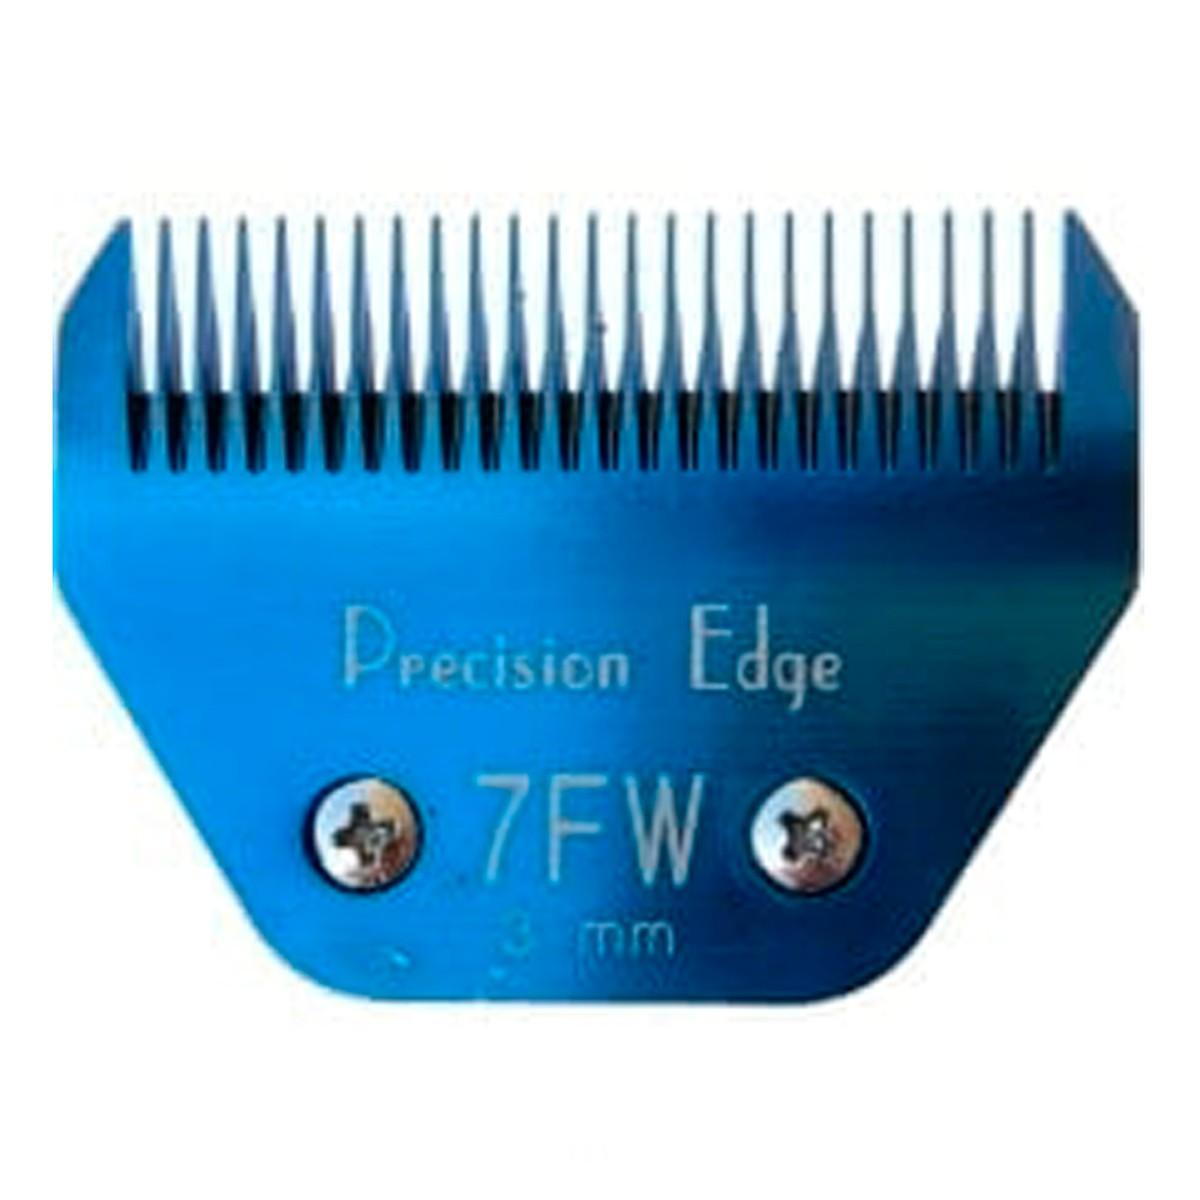 Lâmina Precision Edge 7F Wide Blue - 3,0mm